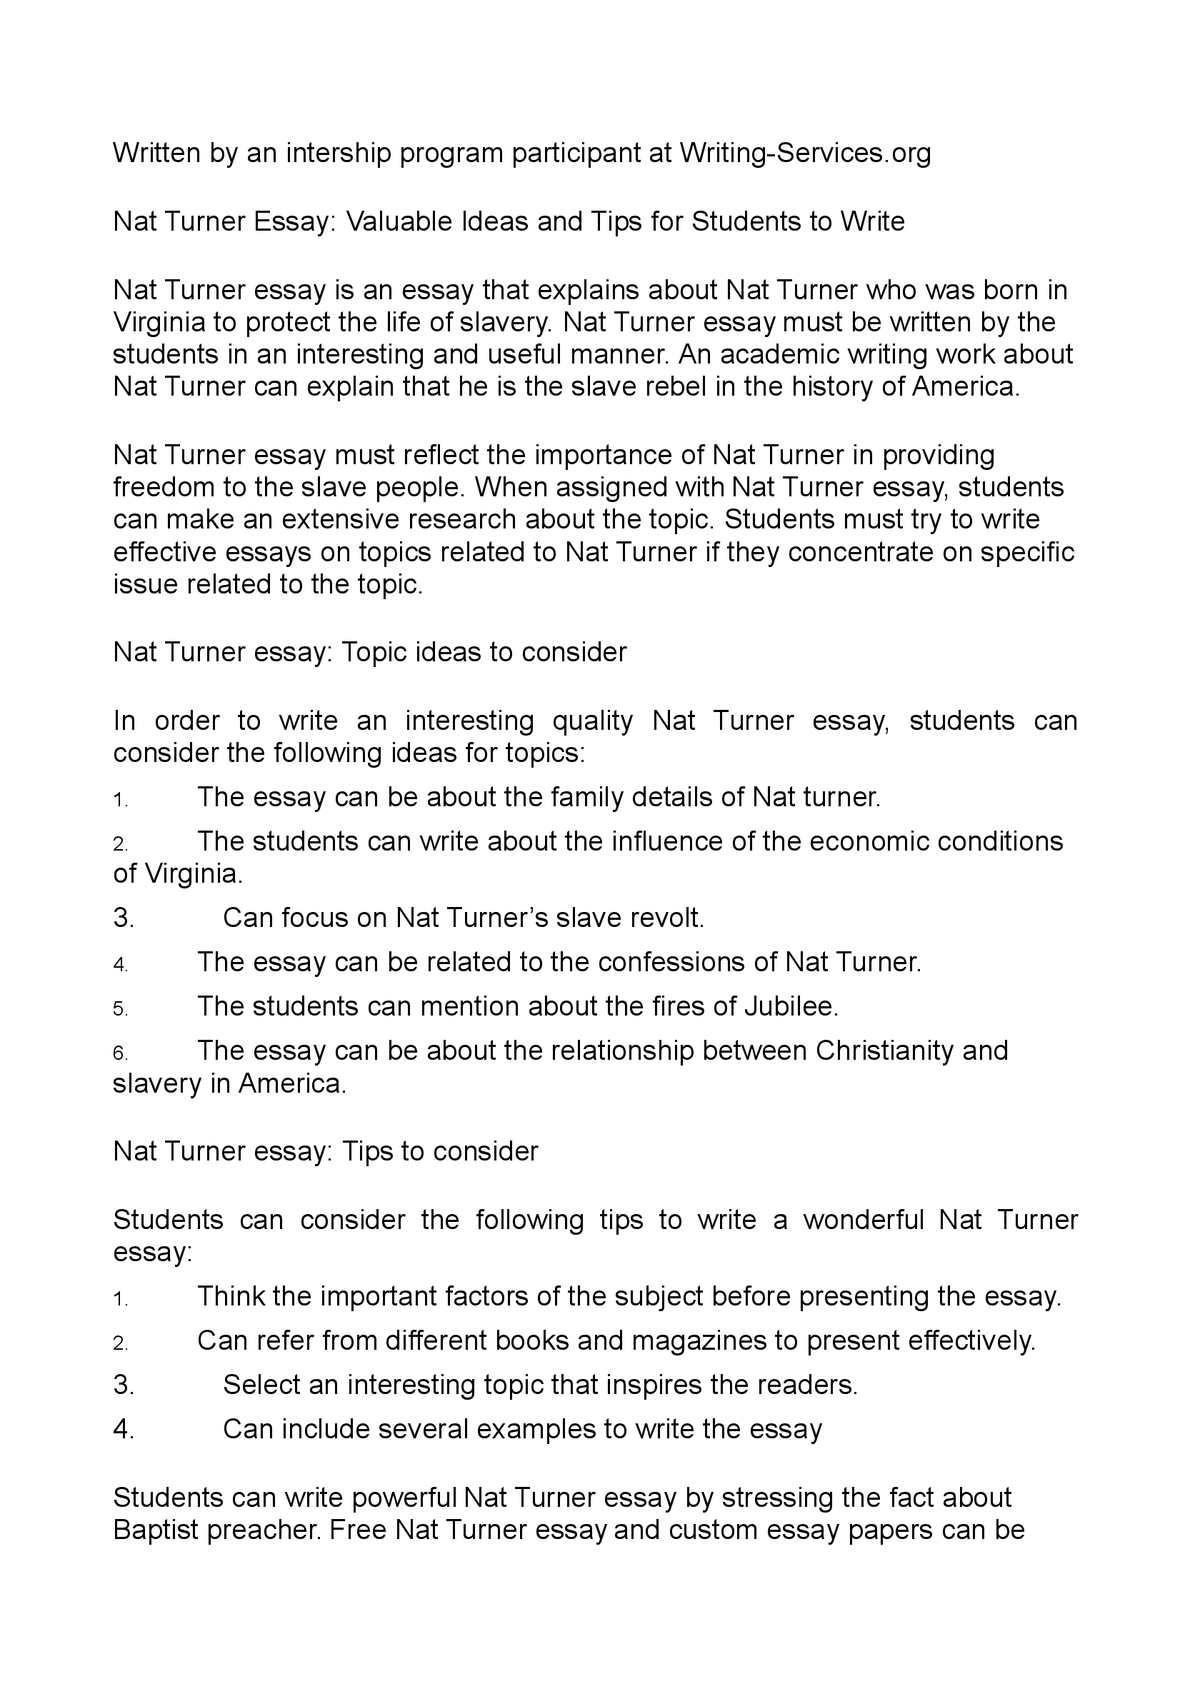 Calamo  Nat Turner Essay Valuable Ideas And Tips For Students To  Calamo  Nat Turner Essay Valuable Ideas And Tips For Students To Write Thesis For Narrative Essay also Persuasive Essay Topics For High School Students  Essay Examples English